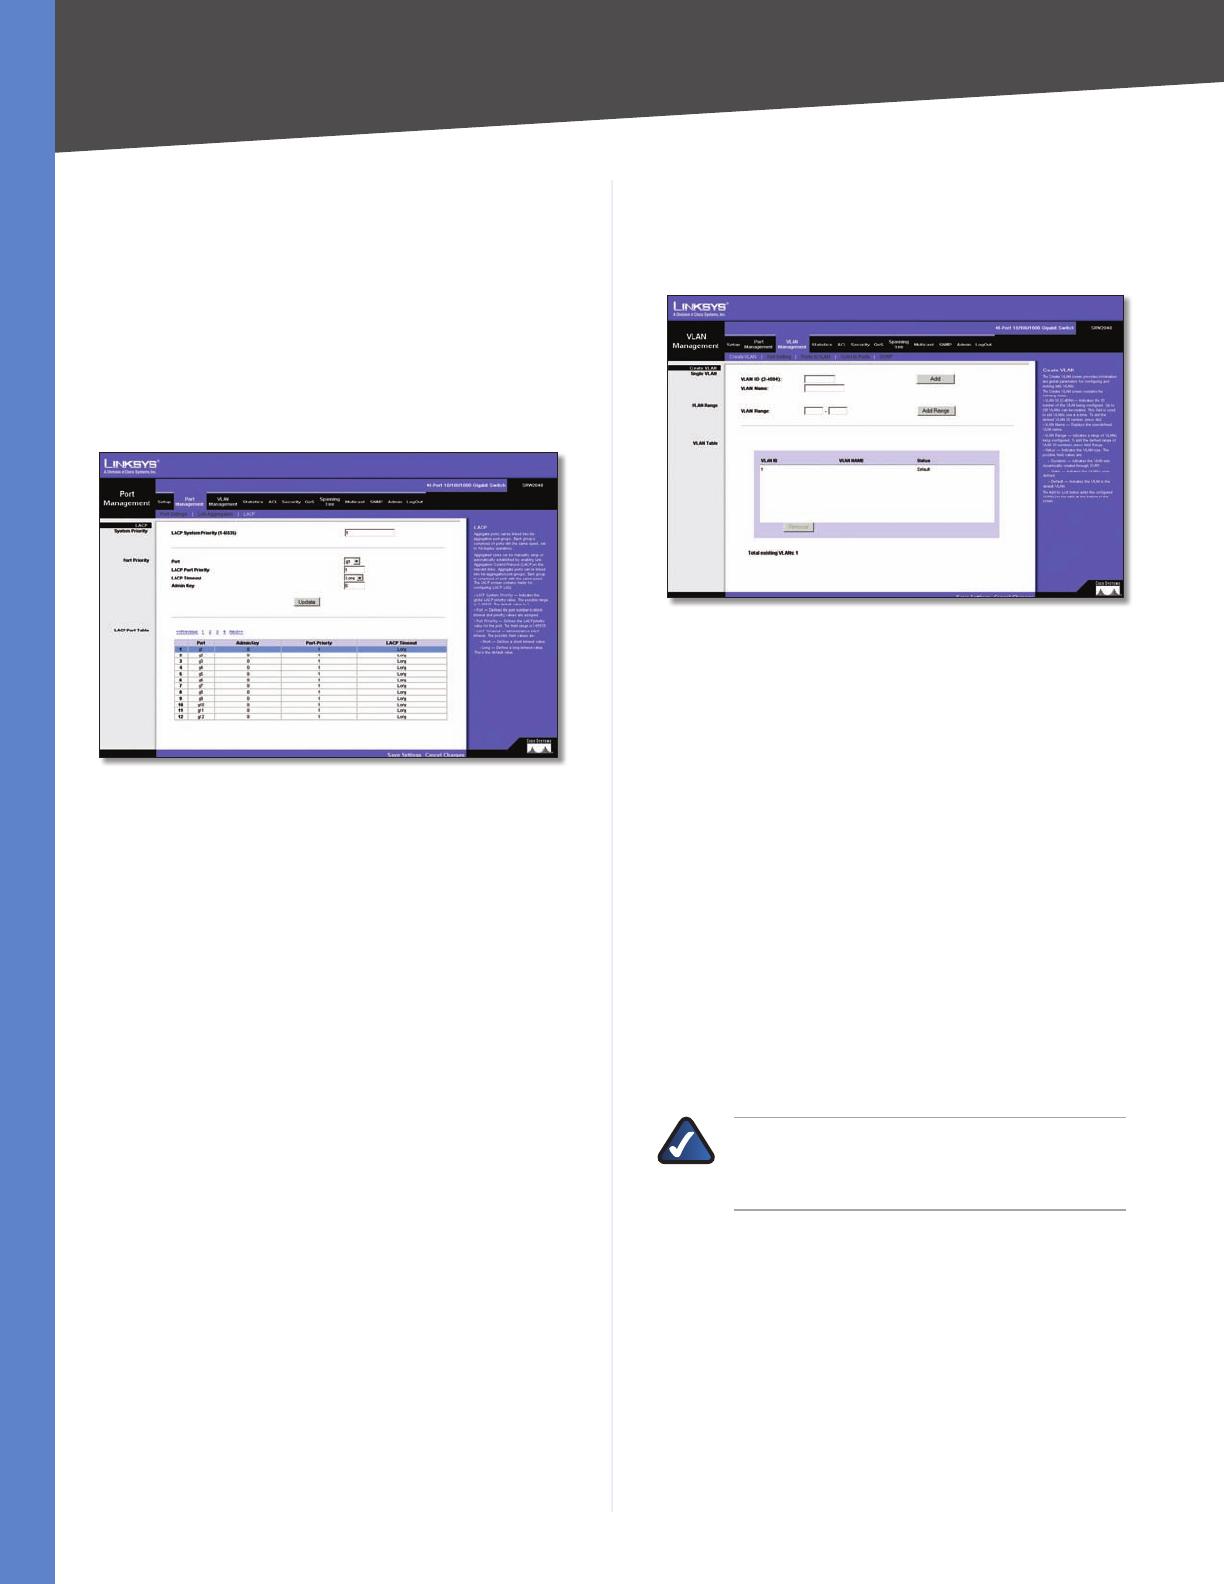 Srw2024 Downloading Code Using Xmodem Cisco - xsonarkeep